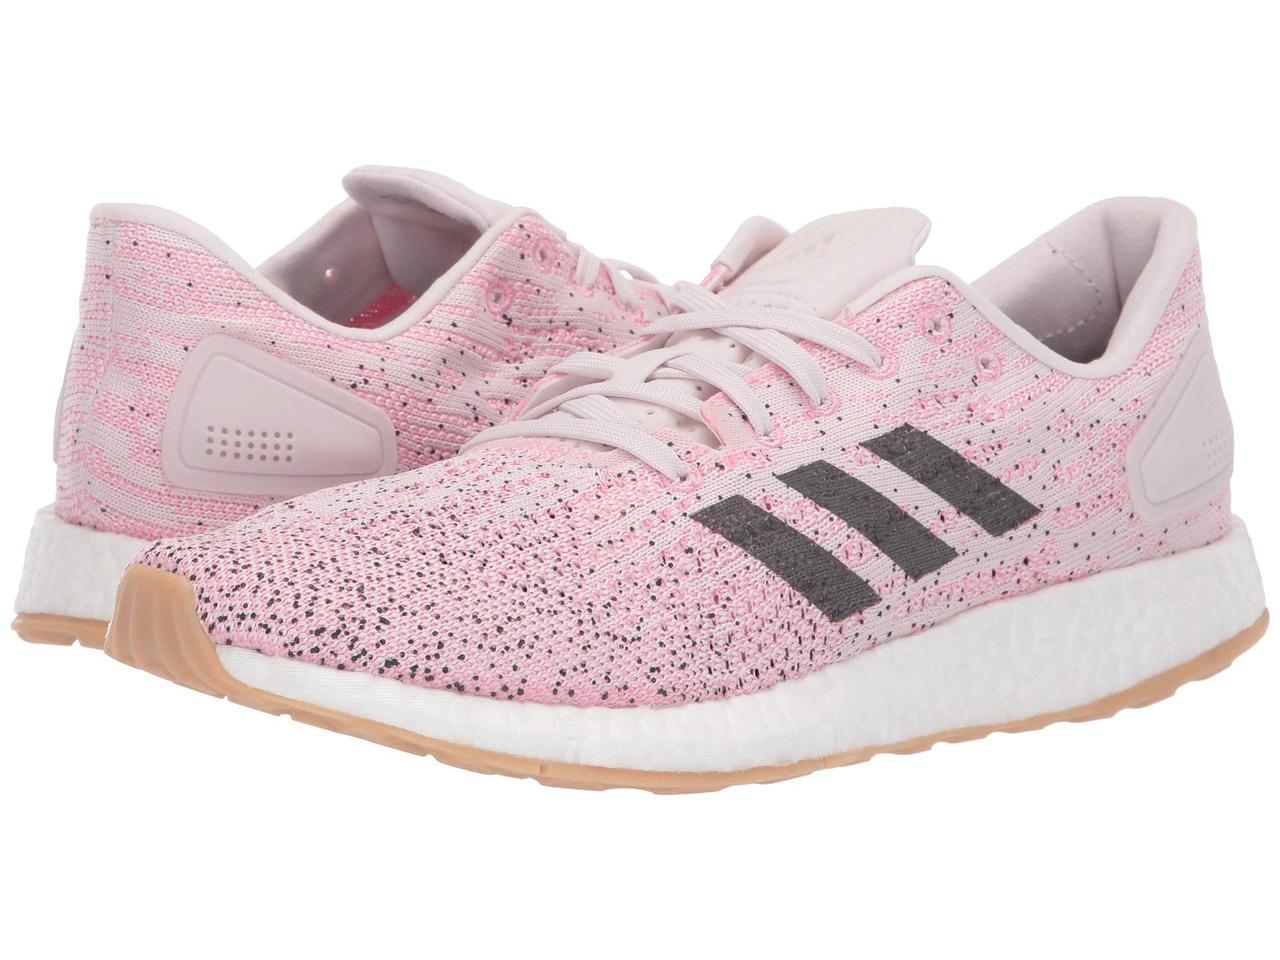 09b82d939fec5b Кроссовки/Кеды (Оригинал) adidas Running PureBOOST DPR True Pink /Carbon/Orchid